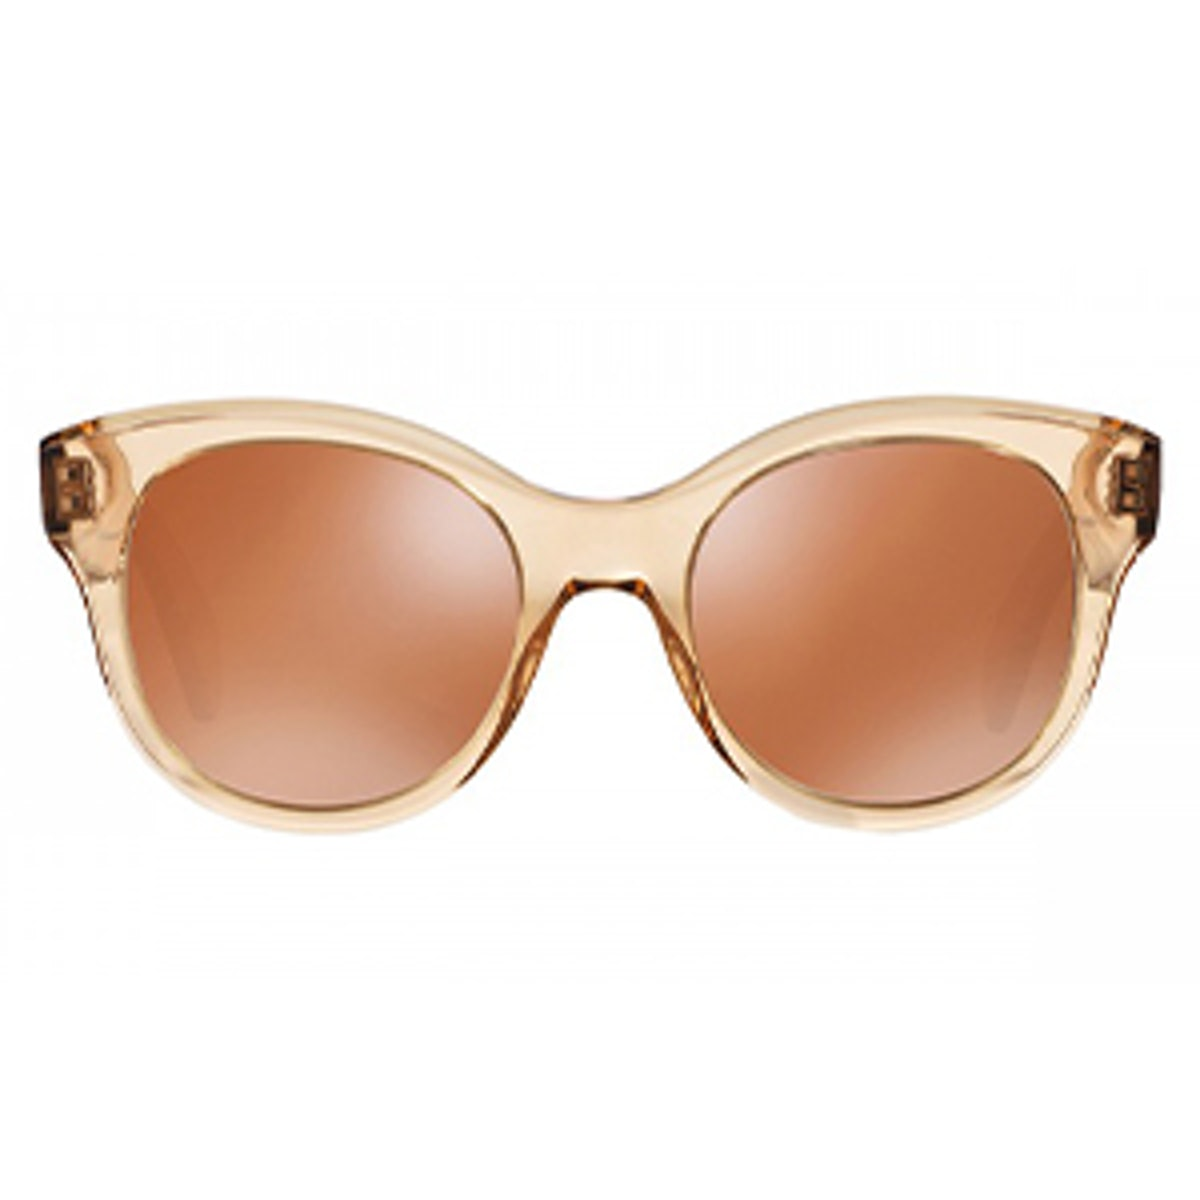 Jacey Sunglasses